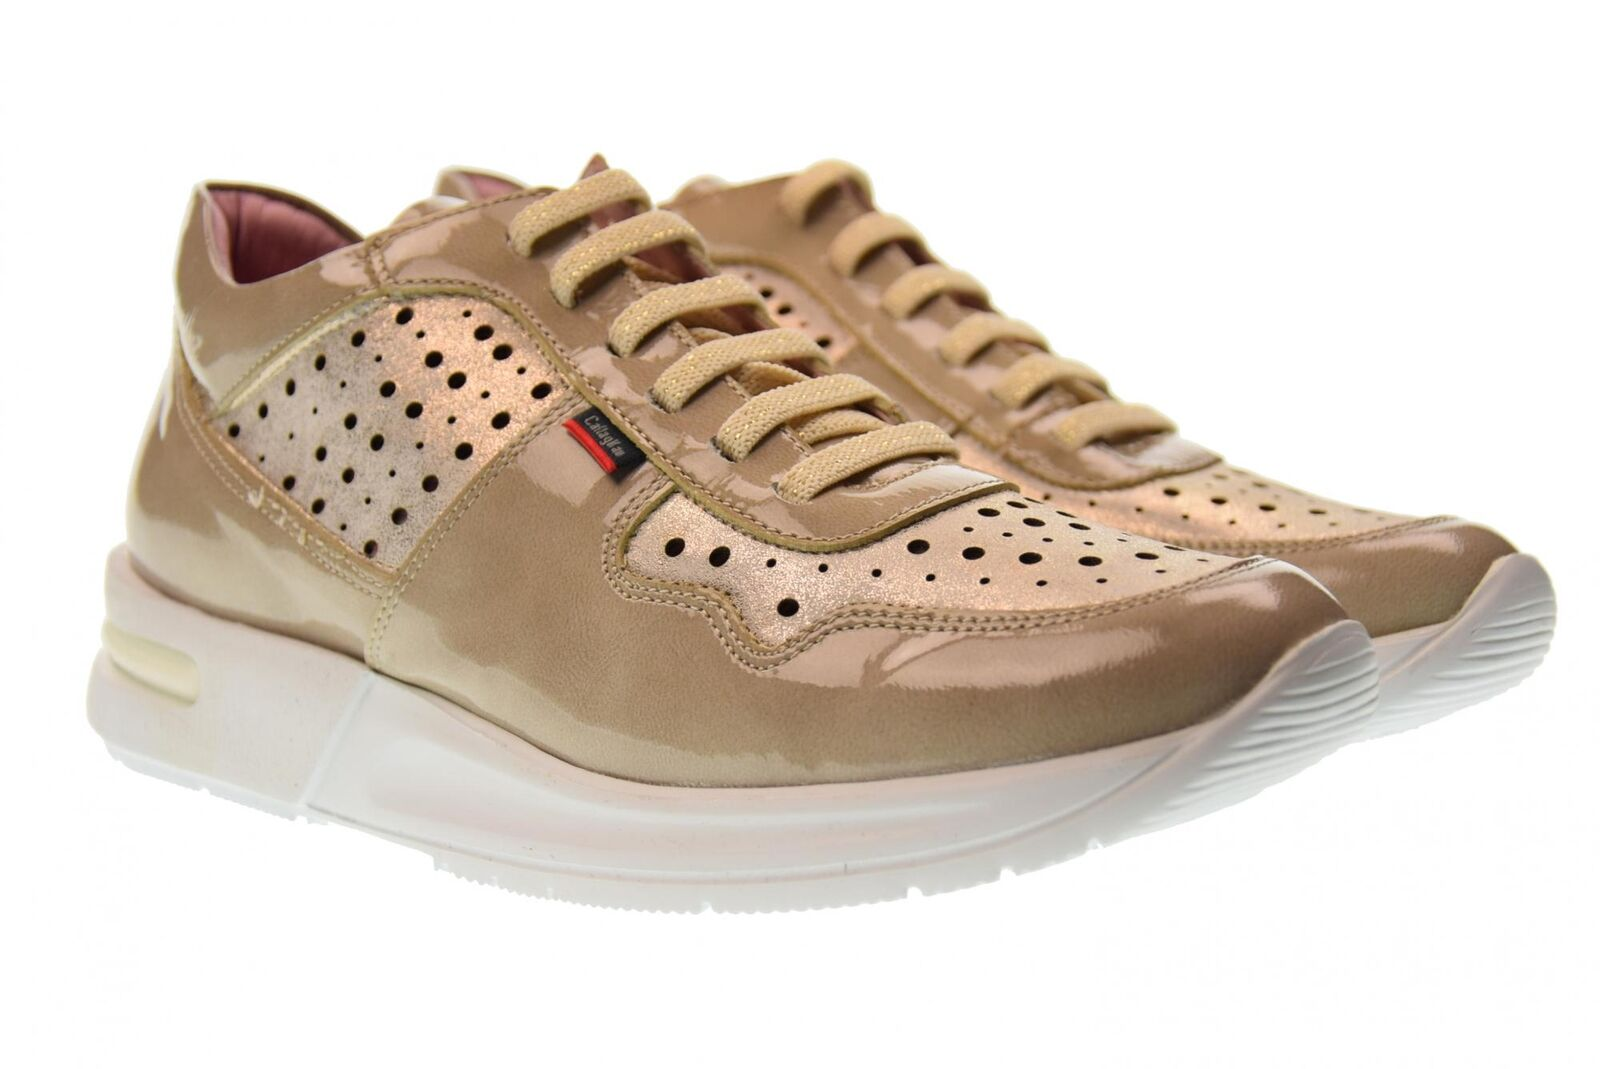 Callaghan Frauen niedrige Turnschuhe Schuhe mit Keil 92108 P18g